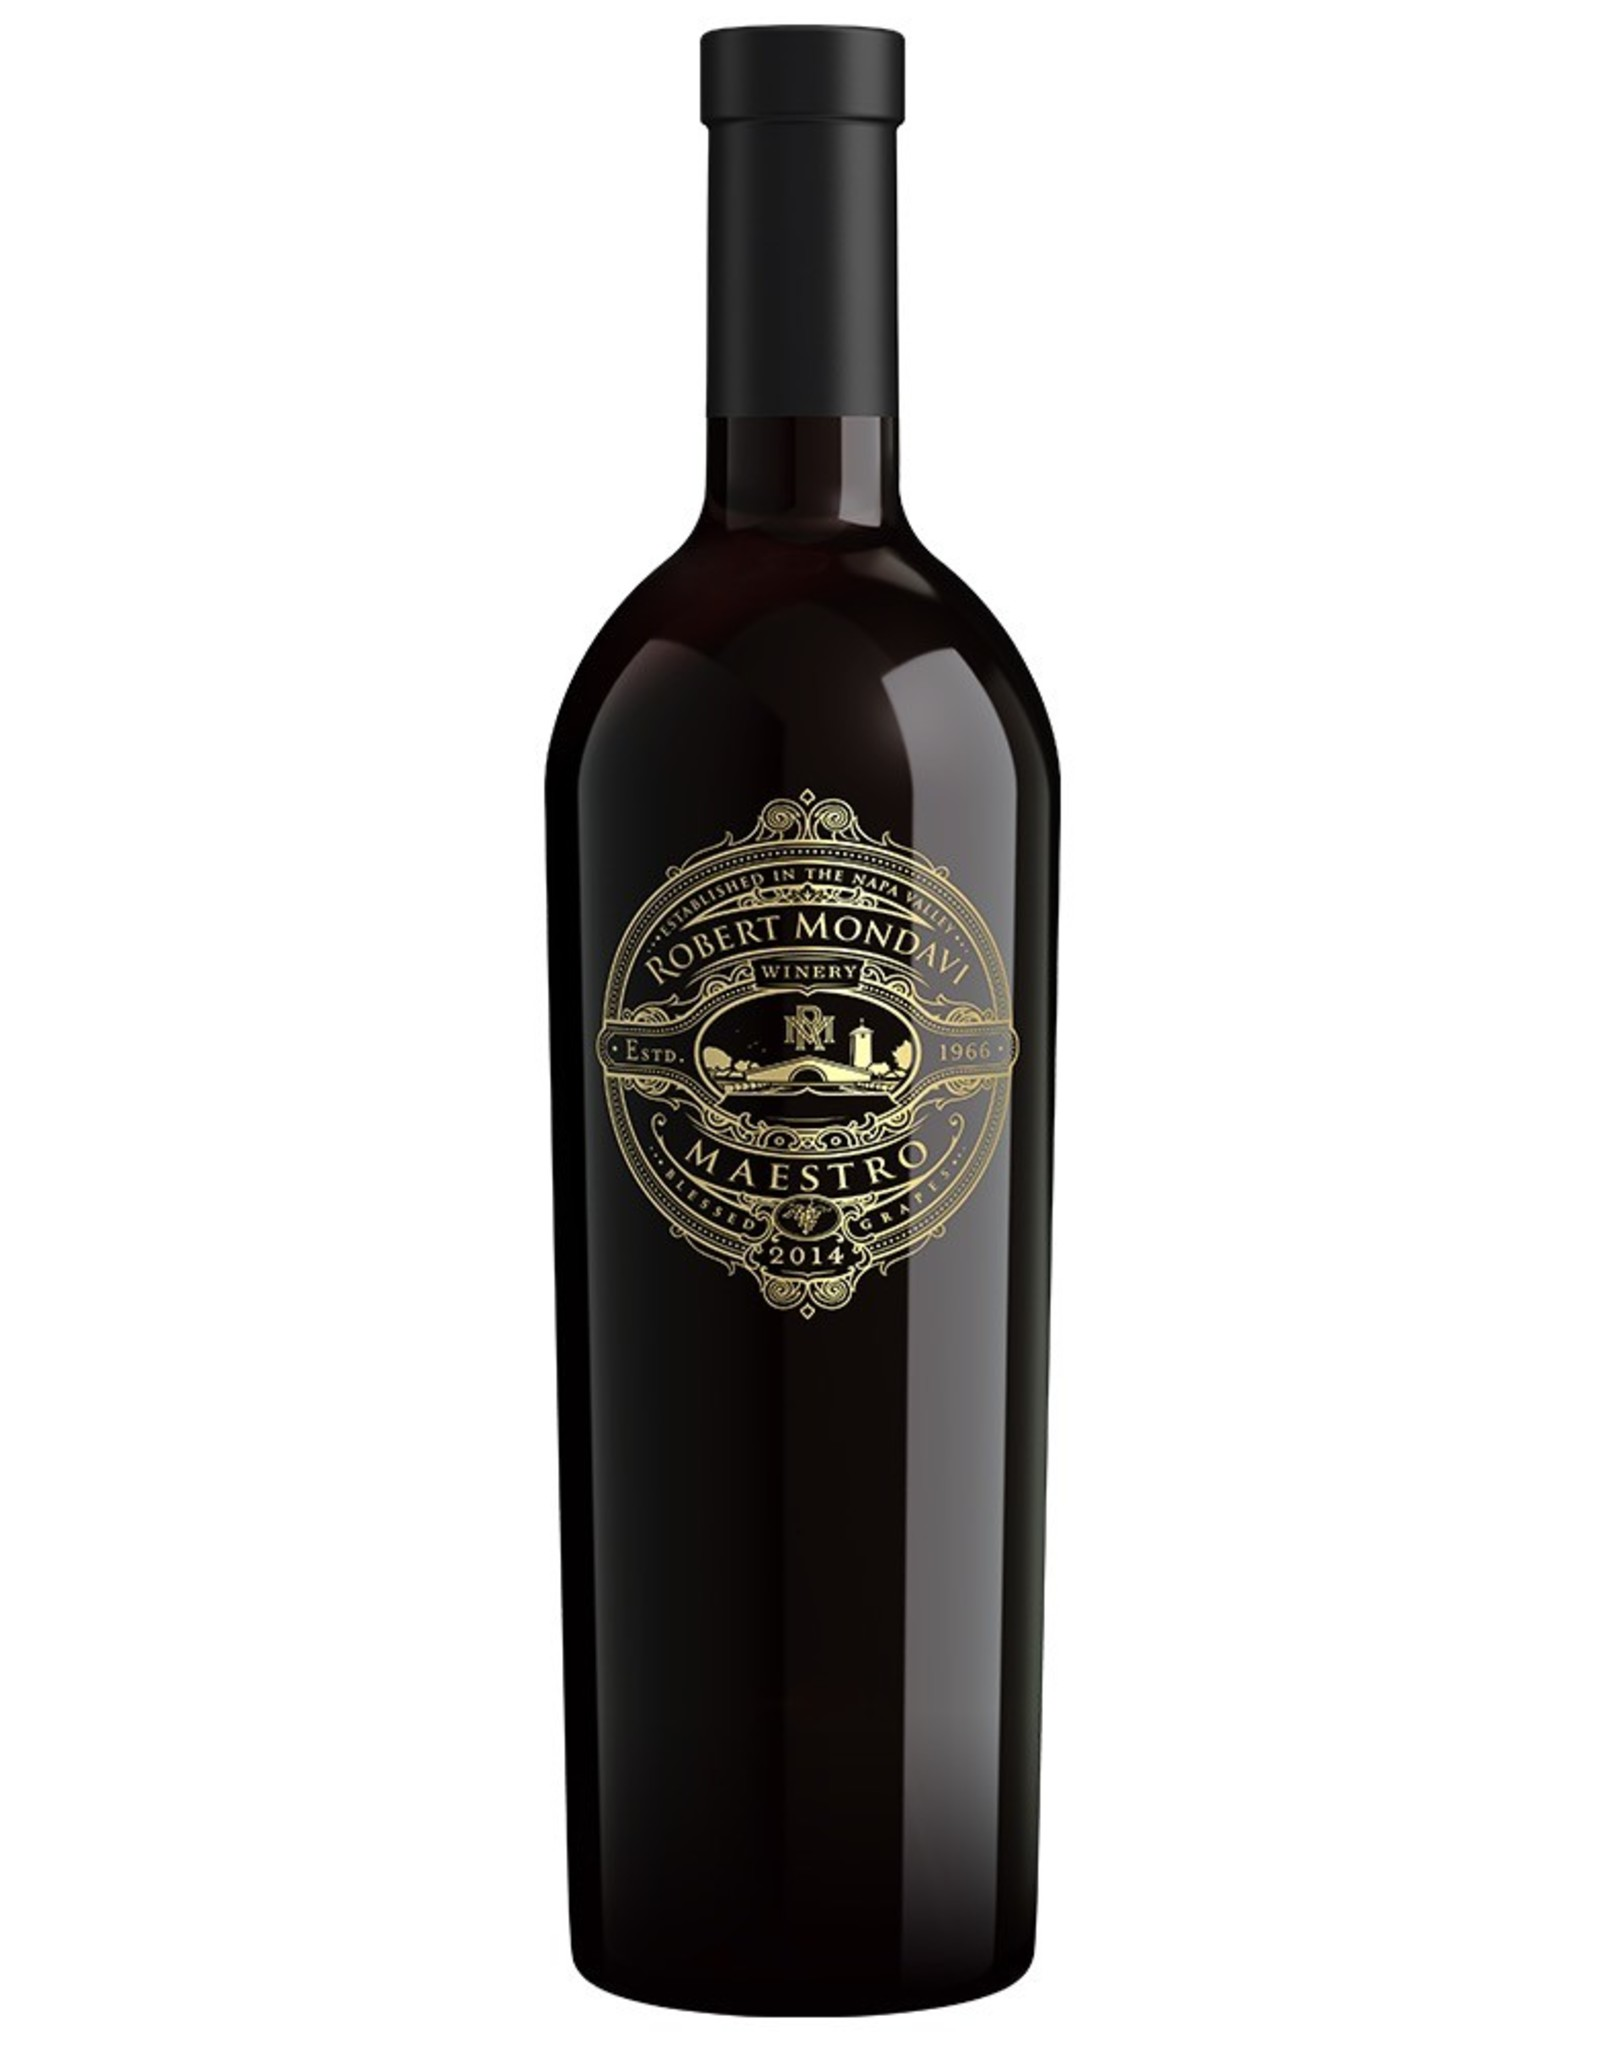 Red Wine 2017, Mondavi Maestro, Red Bordeaux Blend, Napa Valley, North Coast, California, 14.5% Alc, CTnr, TW93